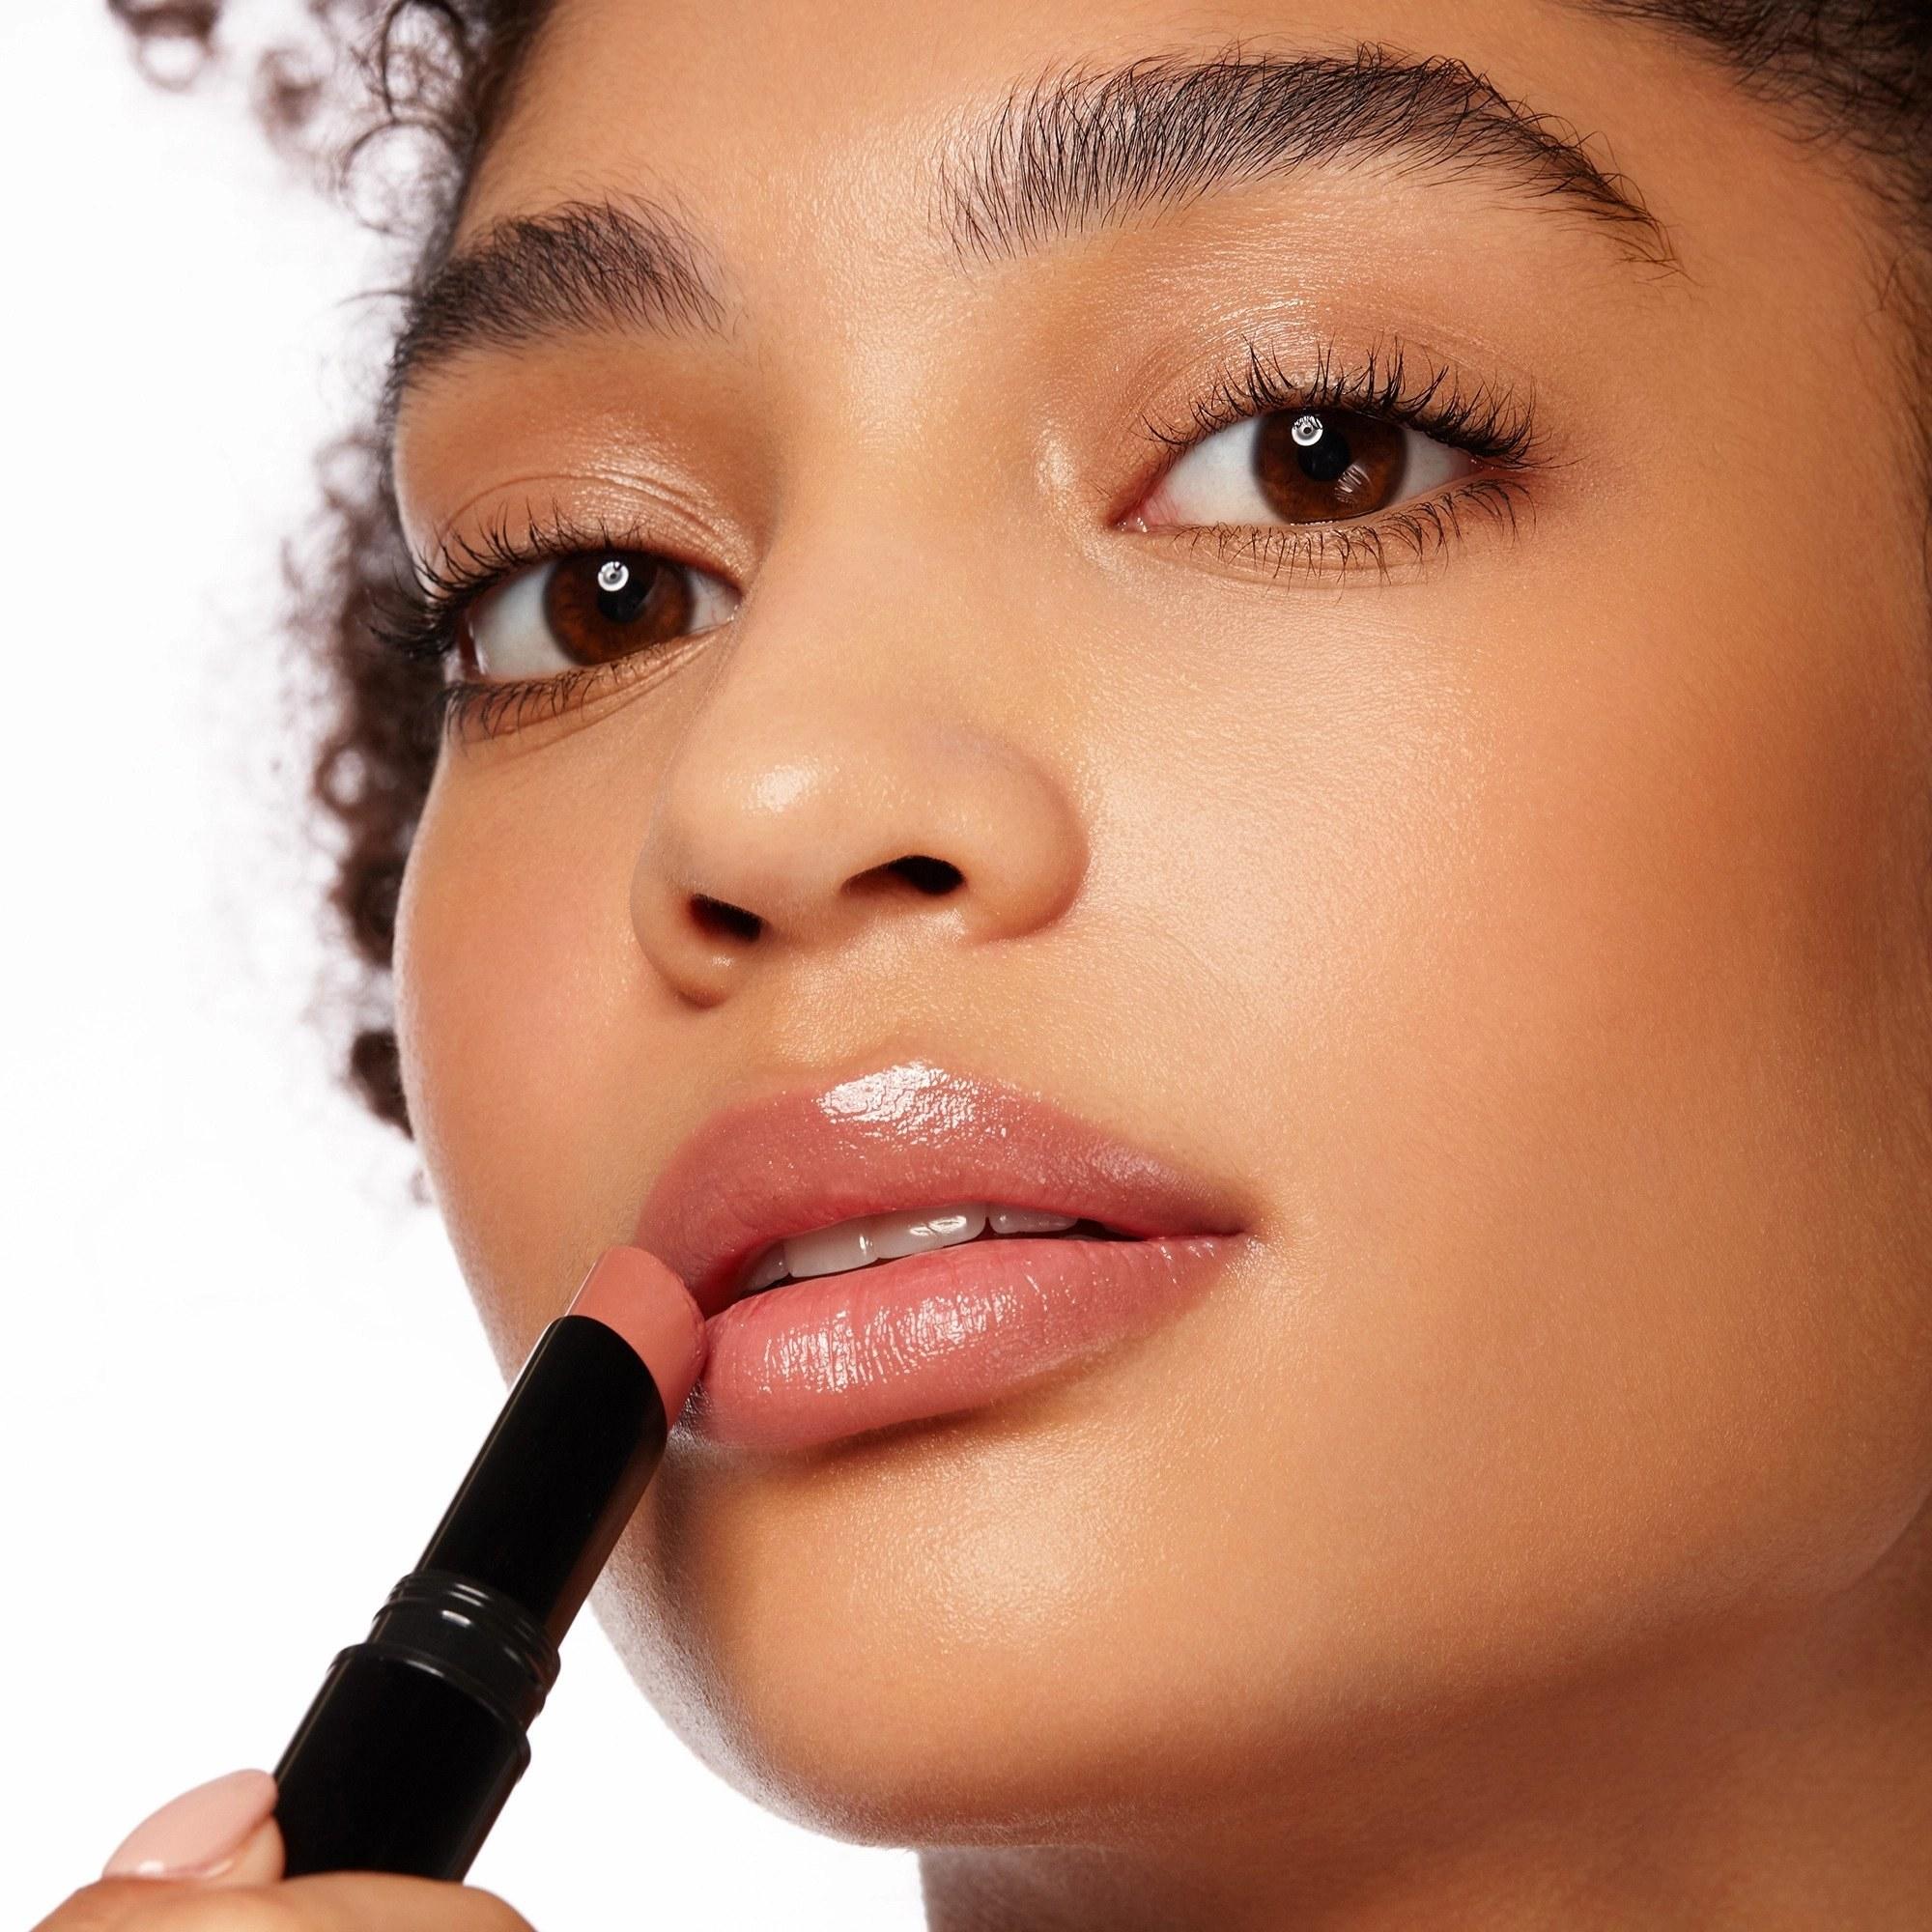 Model applying lipstick to lips